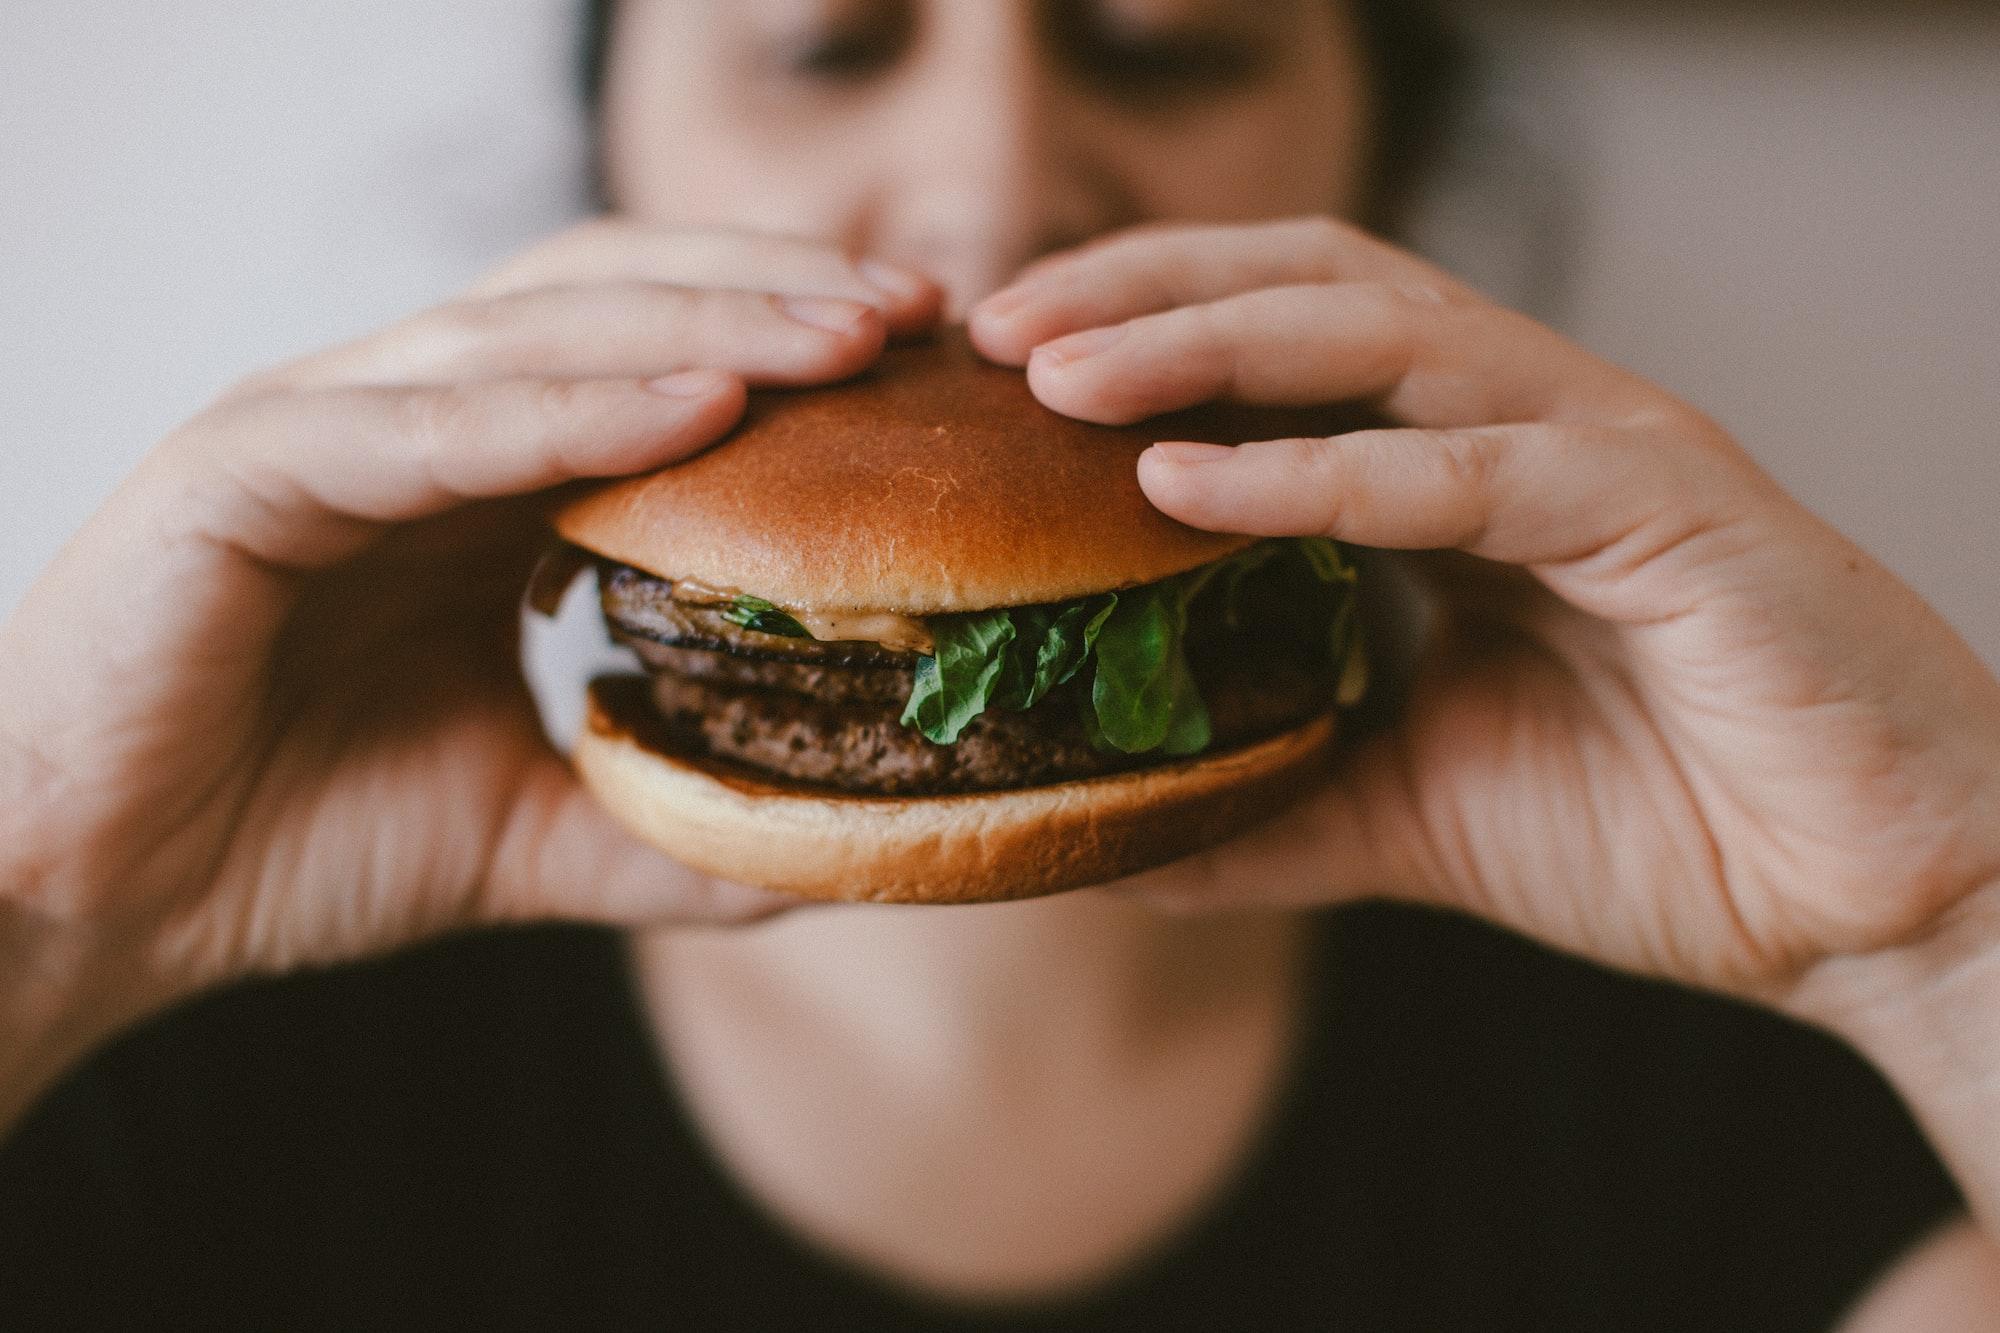 YAMMY 🤤  McDonalds hamburger  Print: http://bit.ly/32ds7QL Behance: http://behance.net/szaboviktor Blog: https://blog.szaboviktor.com  Support: https://www.paypal.me/szaboviktor  My presets: https://bit.ly/2TyvzRK